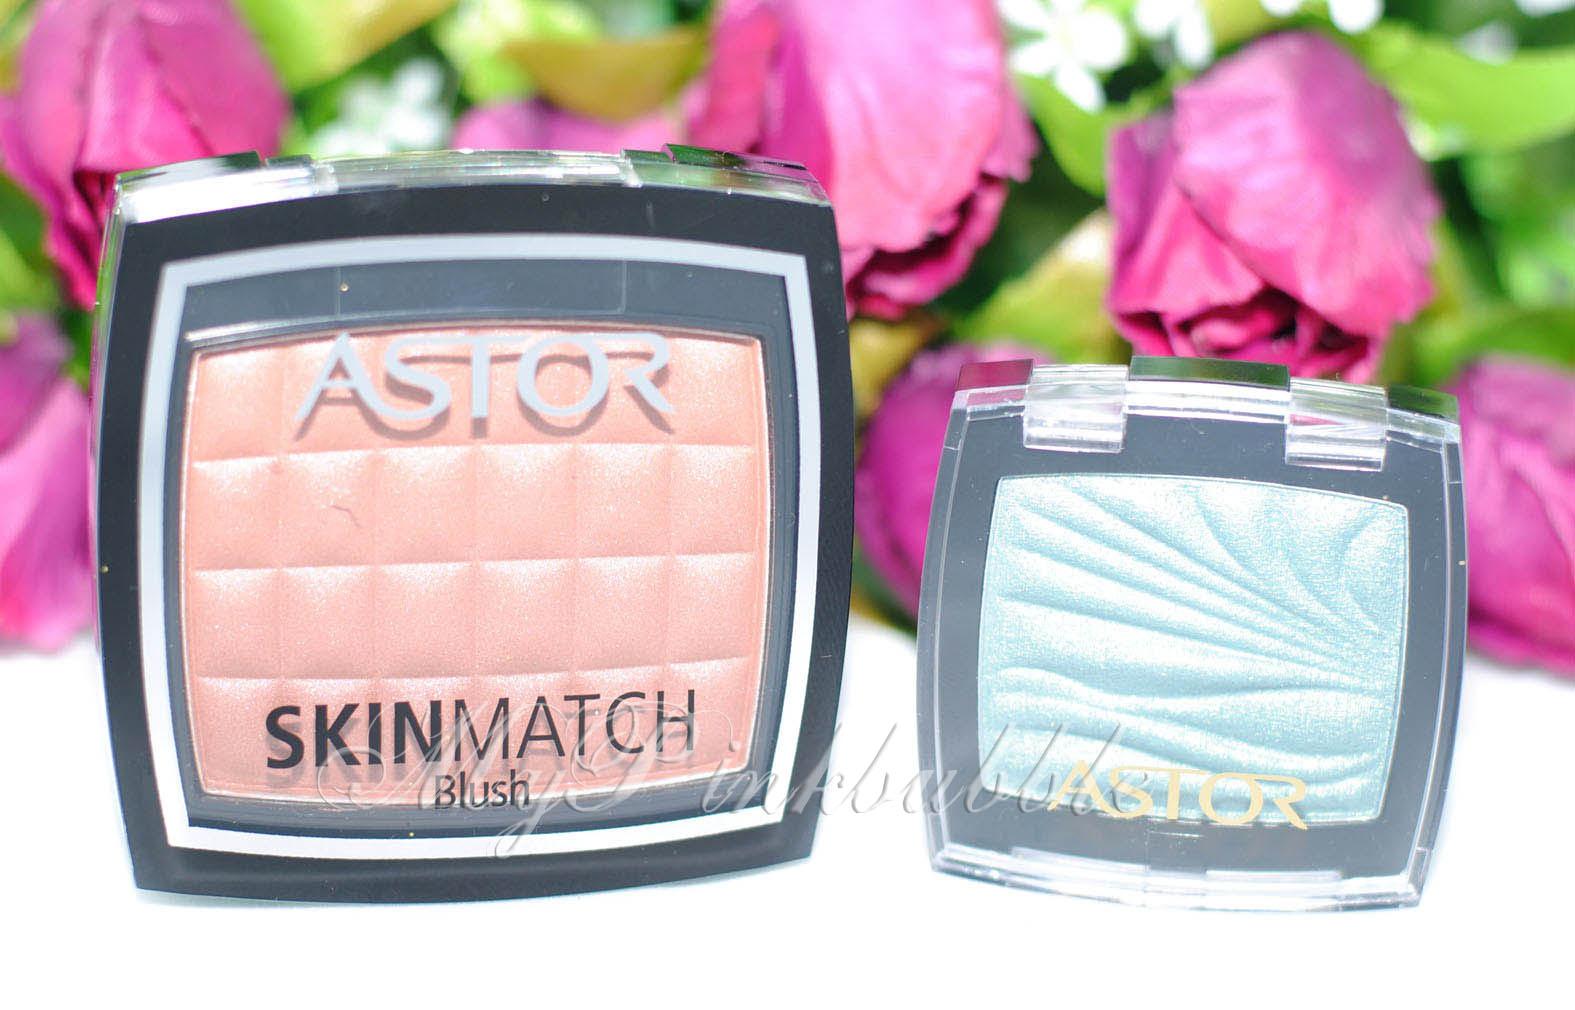 astor blush skinmatch colorwaves